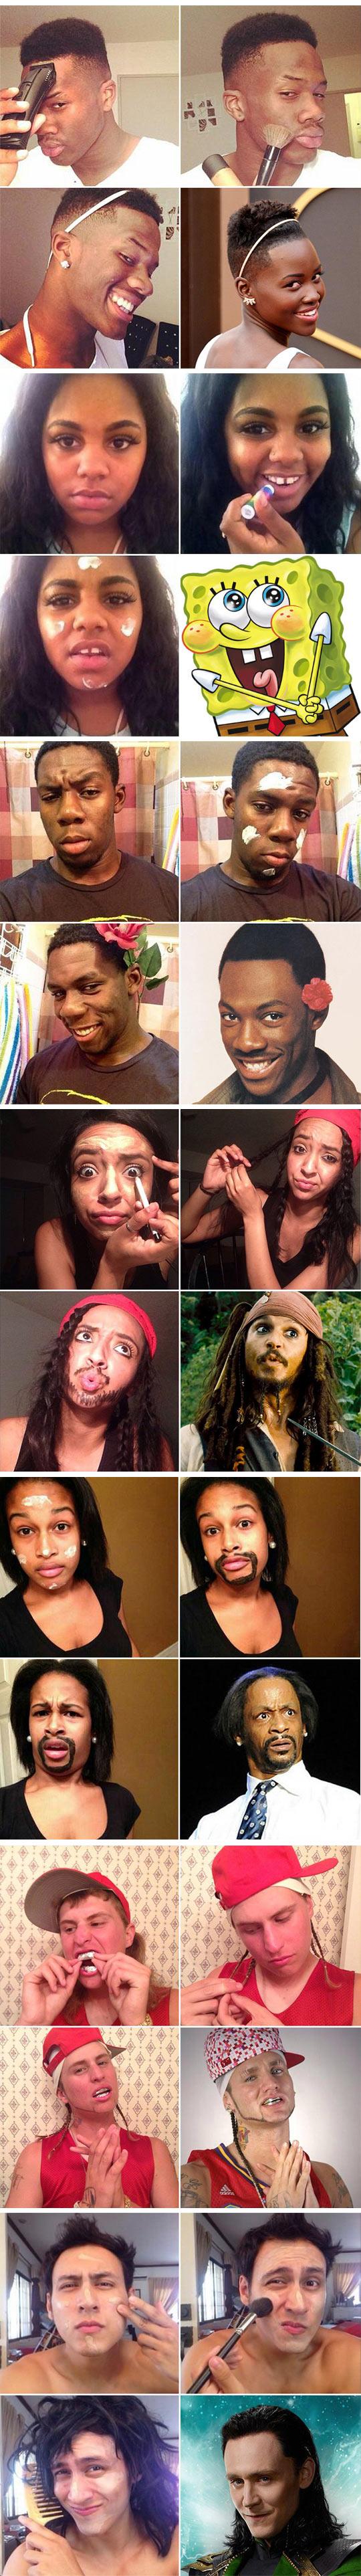 funny-men-makeup-famous-actors-Loki